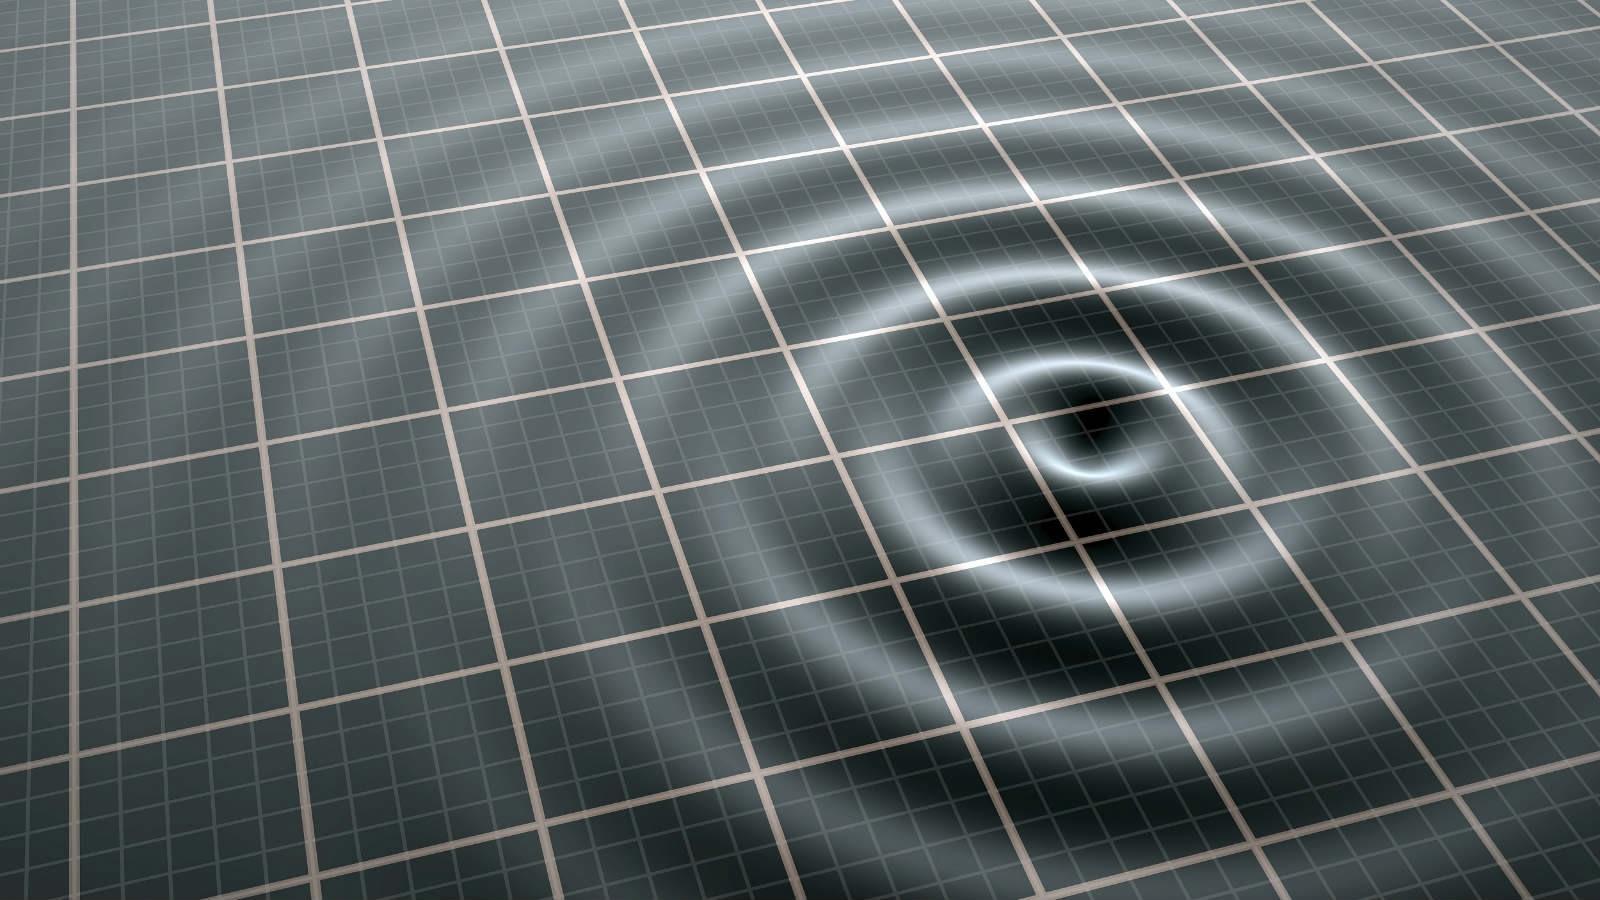 5.2-magnitude quake hits Whitianga of New Zealand: USGS